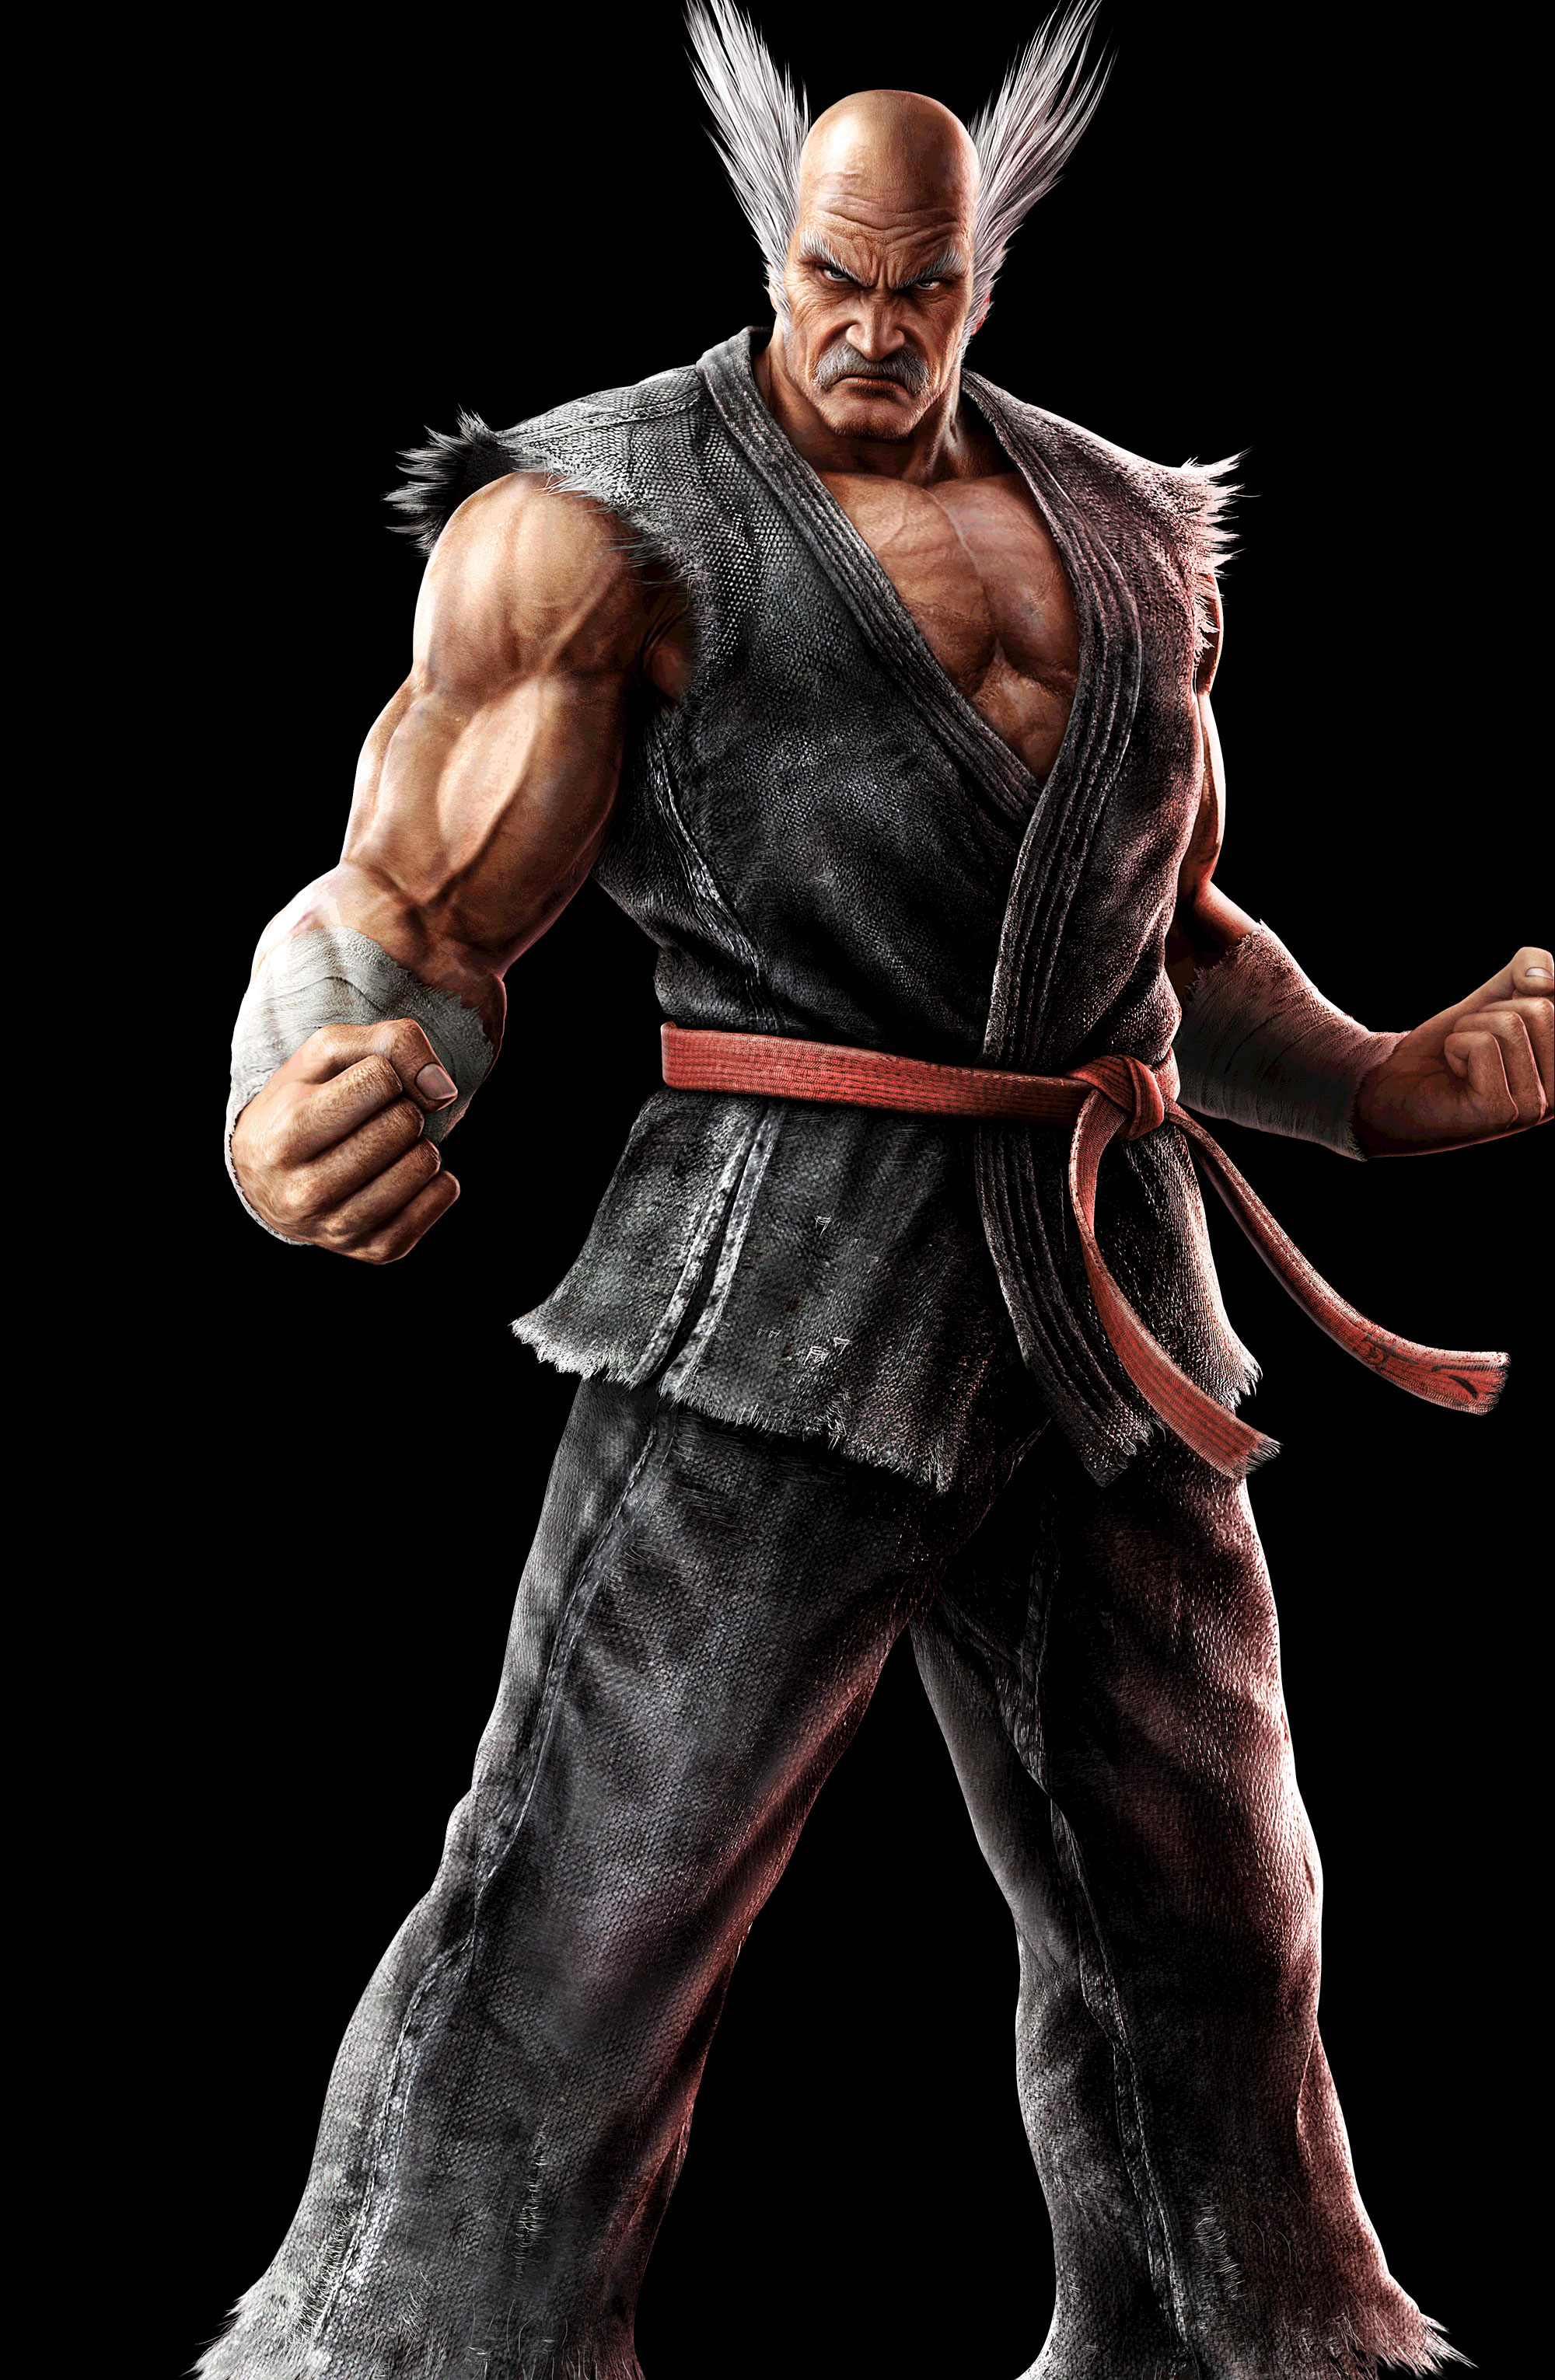 Tekken character Heihachi strikes a fighting pose